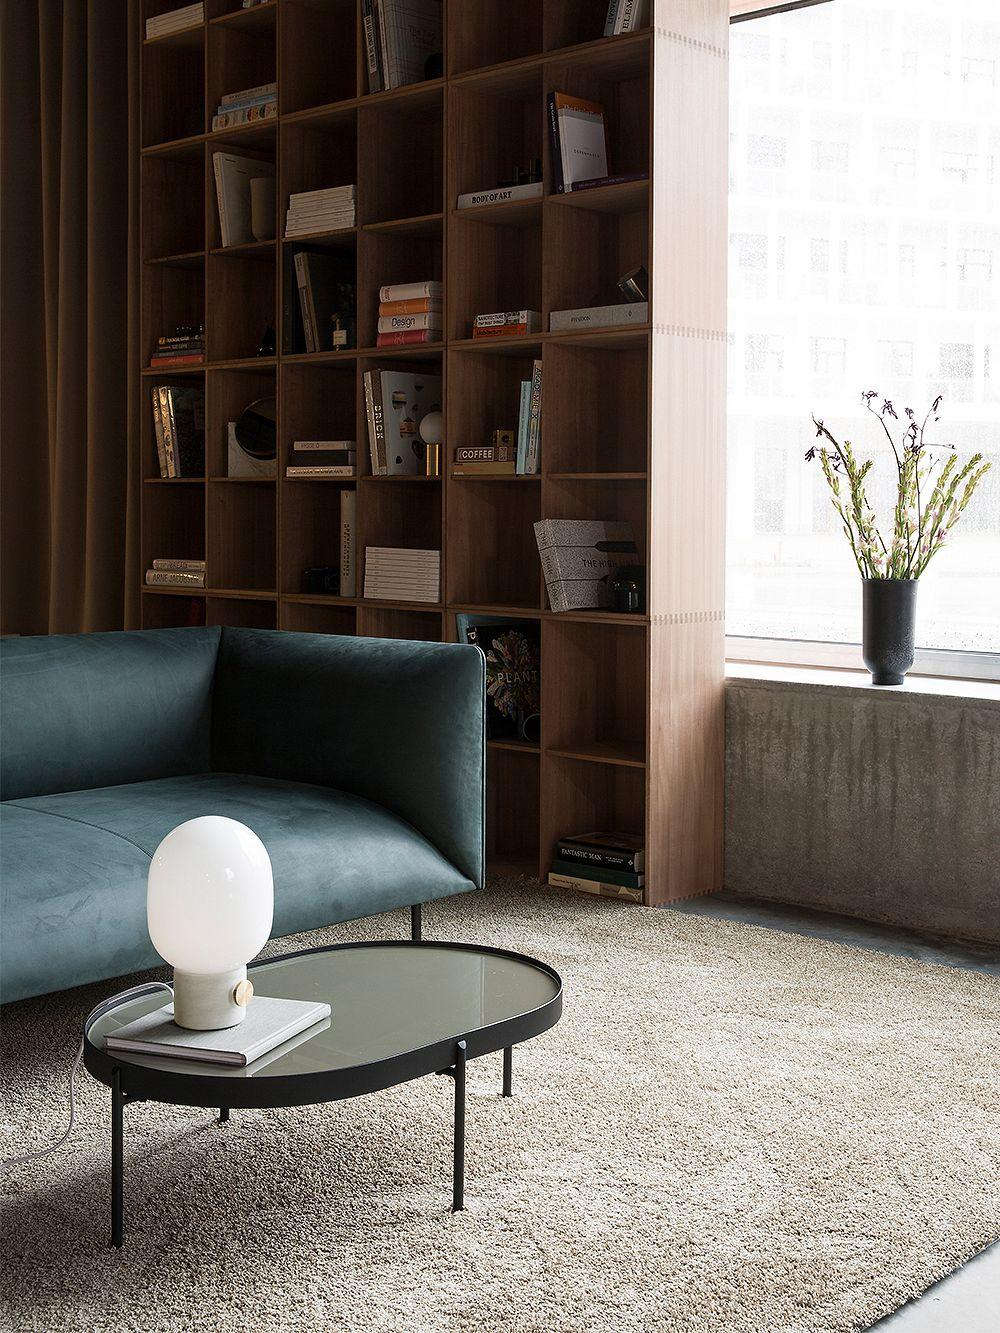 Menu's white table lamp, JWDA, in living room decor.